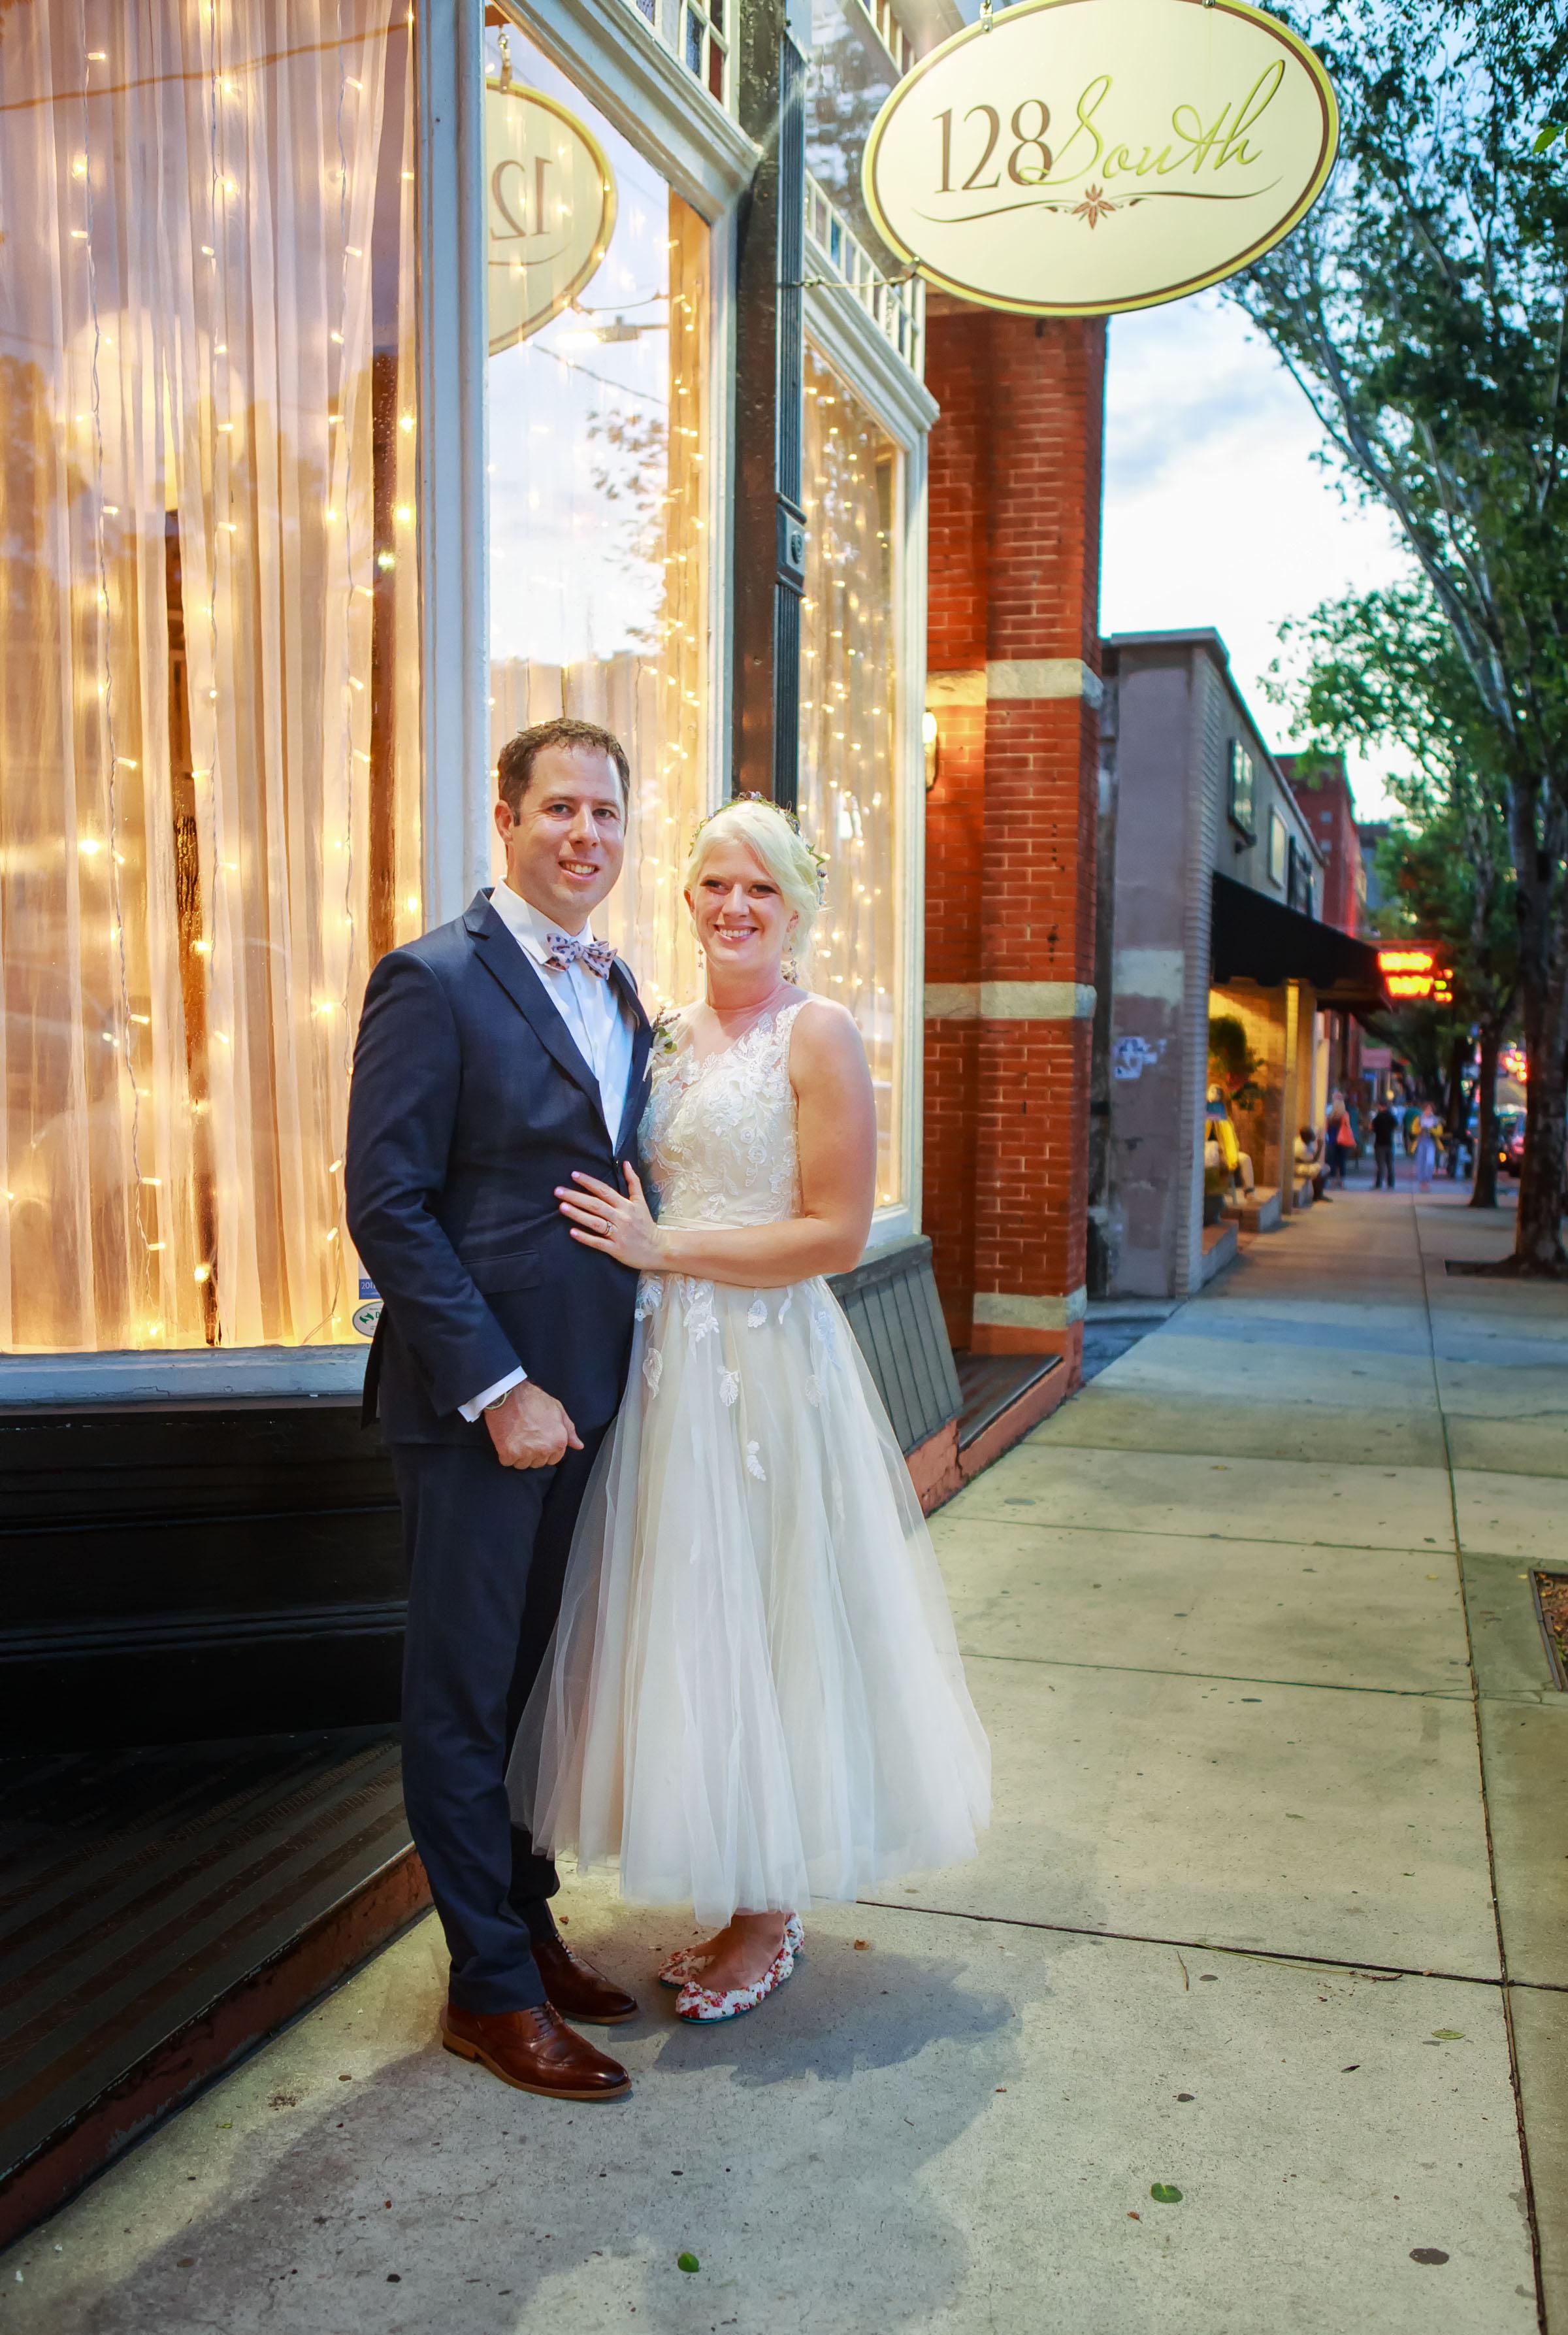 128-South-Wedding-Tiffany-Abruzzo-Photography-Bride-&-Groom-70.jpg